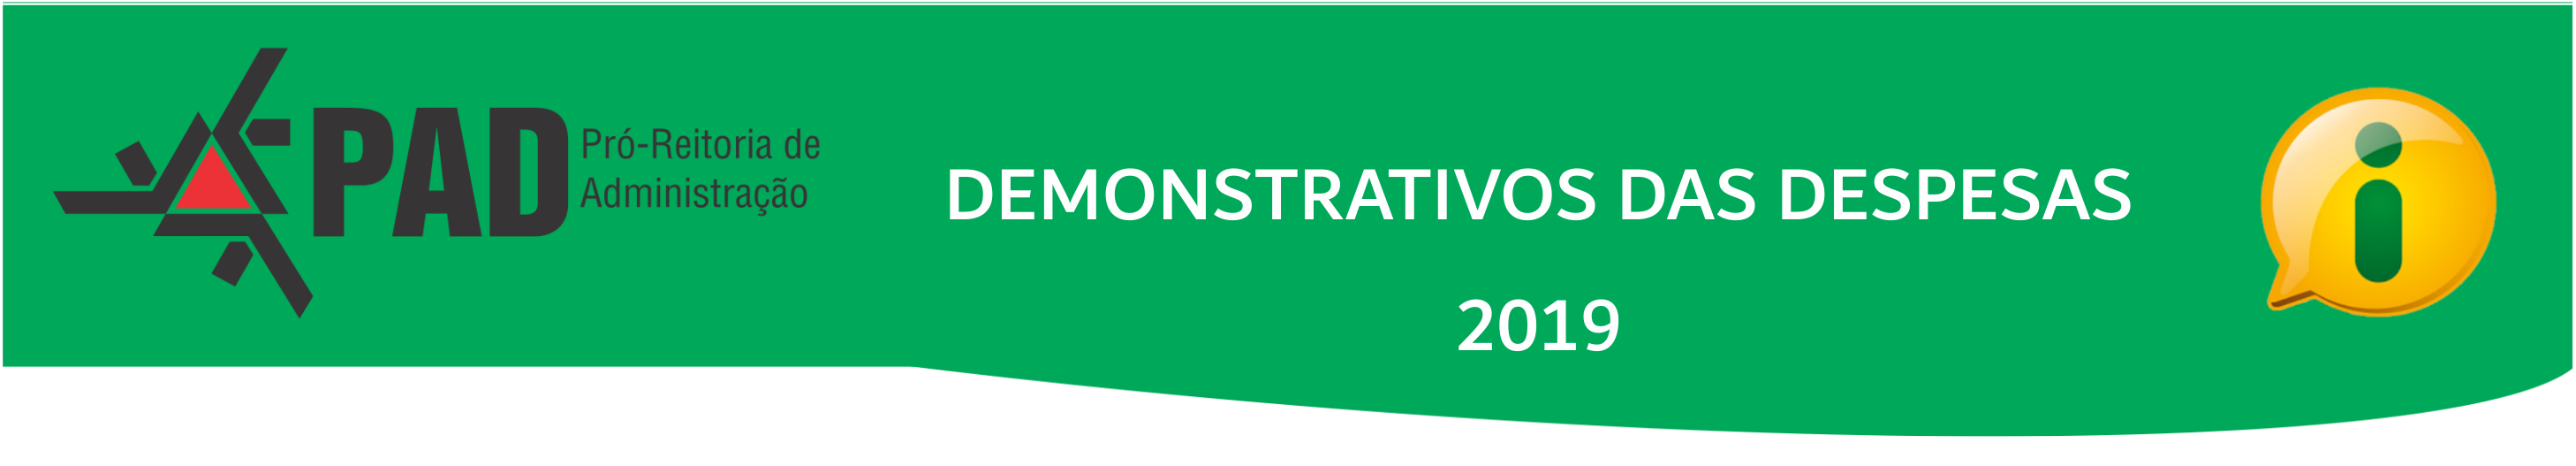 Demonstrativos Desp. 2019.png